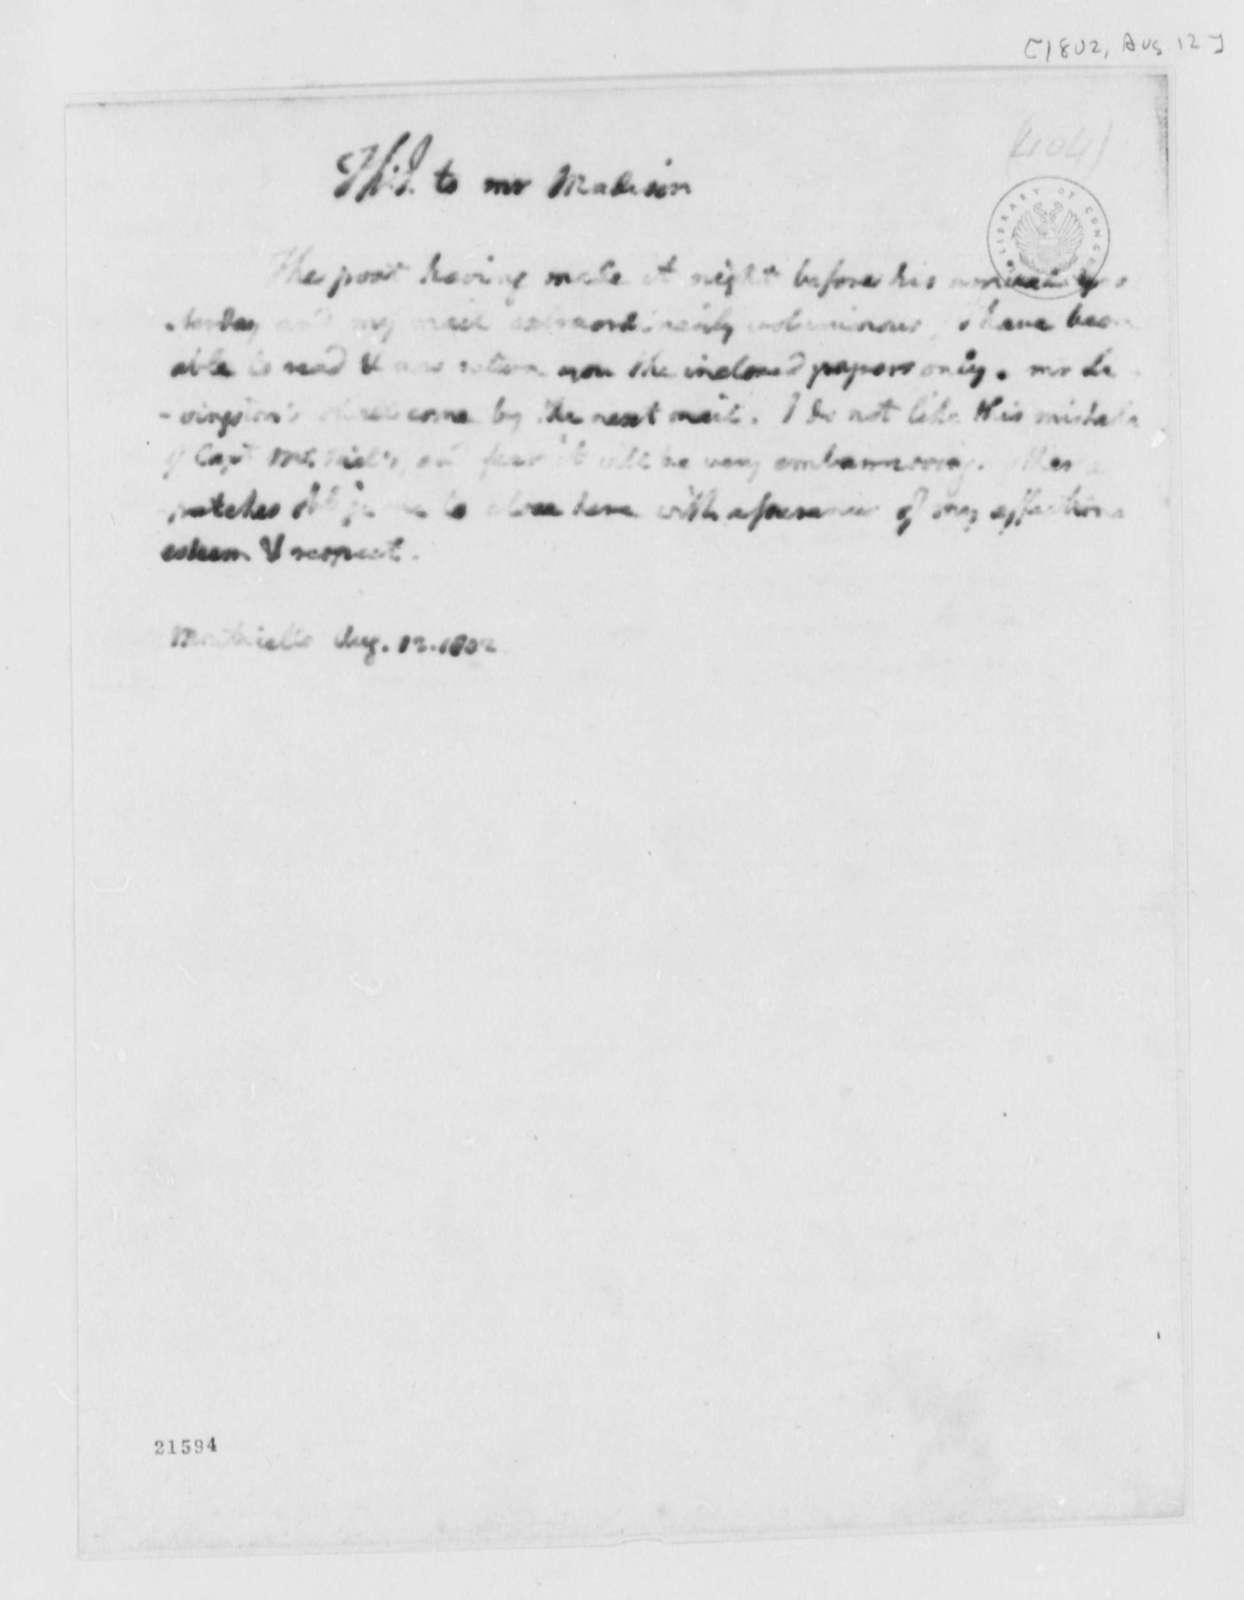 Thomas Jefferson to James Madison, August 12, 1802